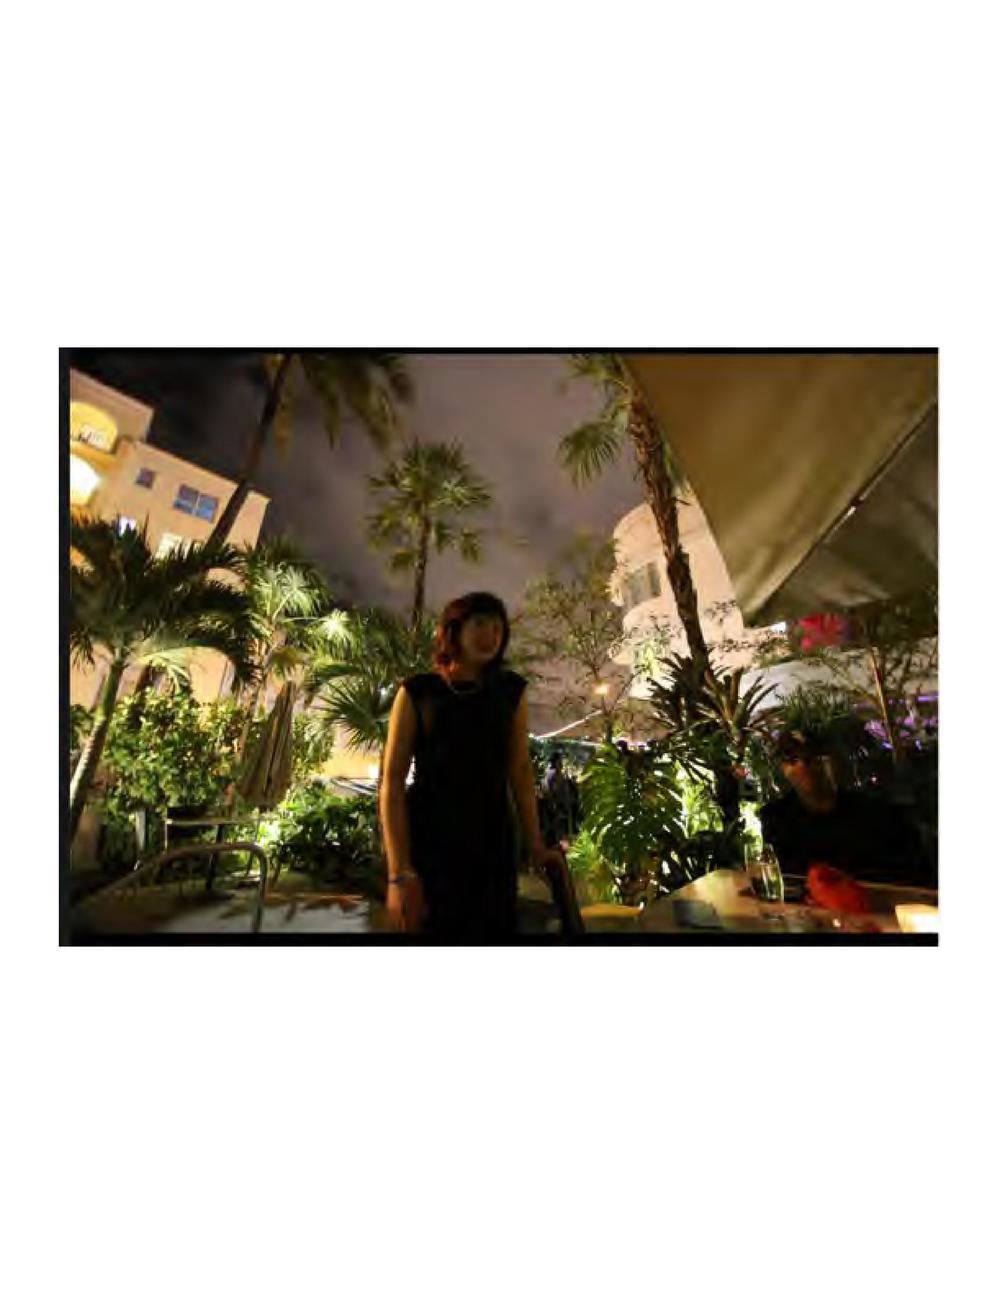 Miami_Art_Basel_Photographs-web-page-076.jpg